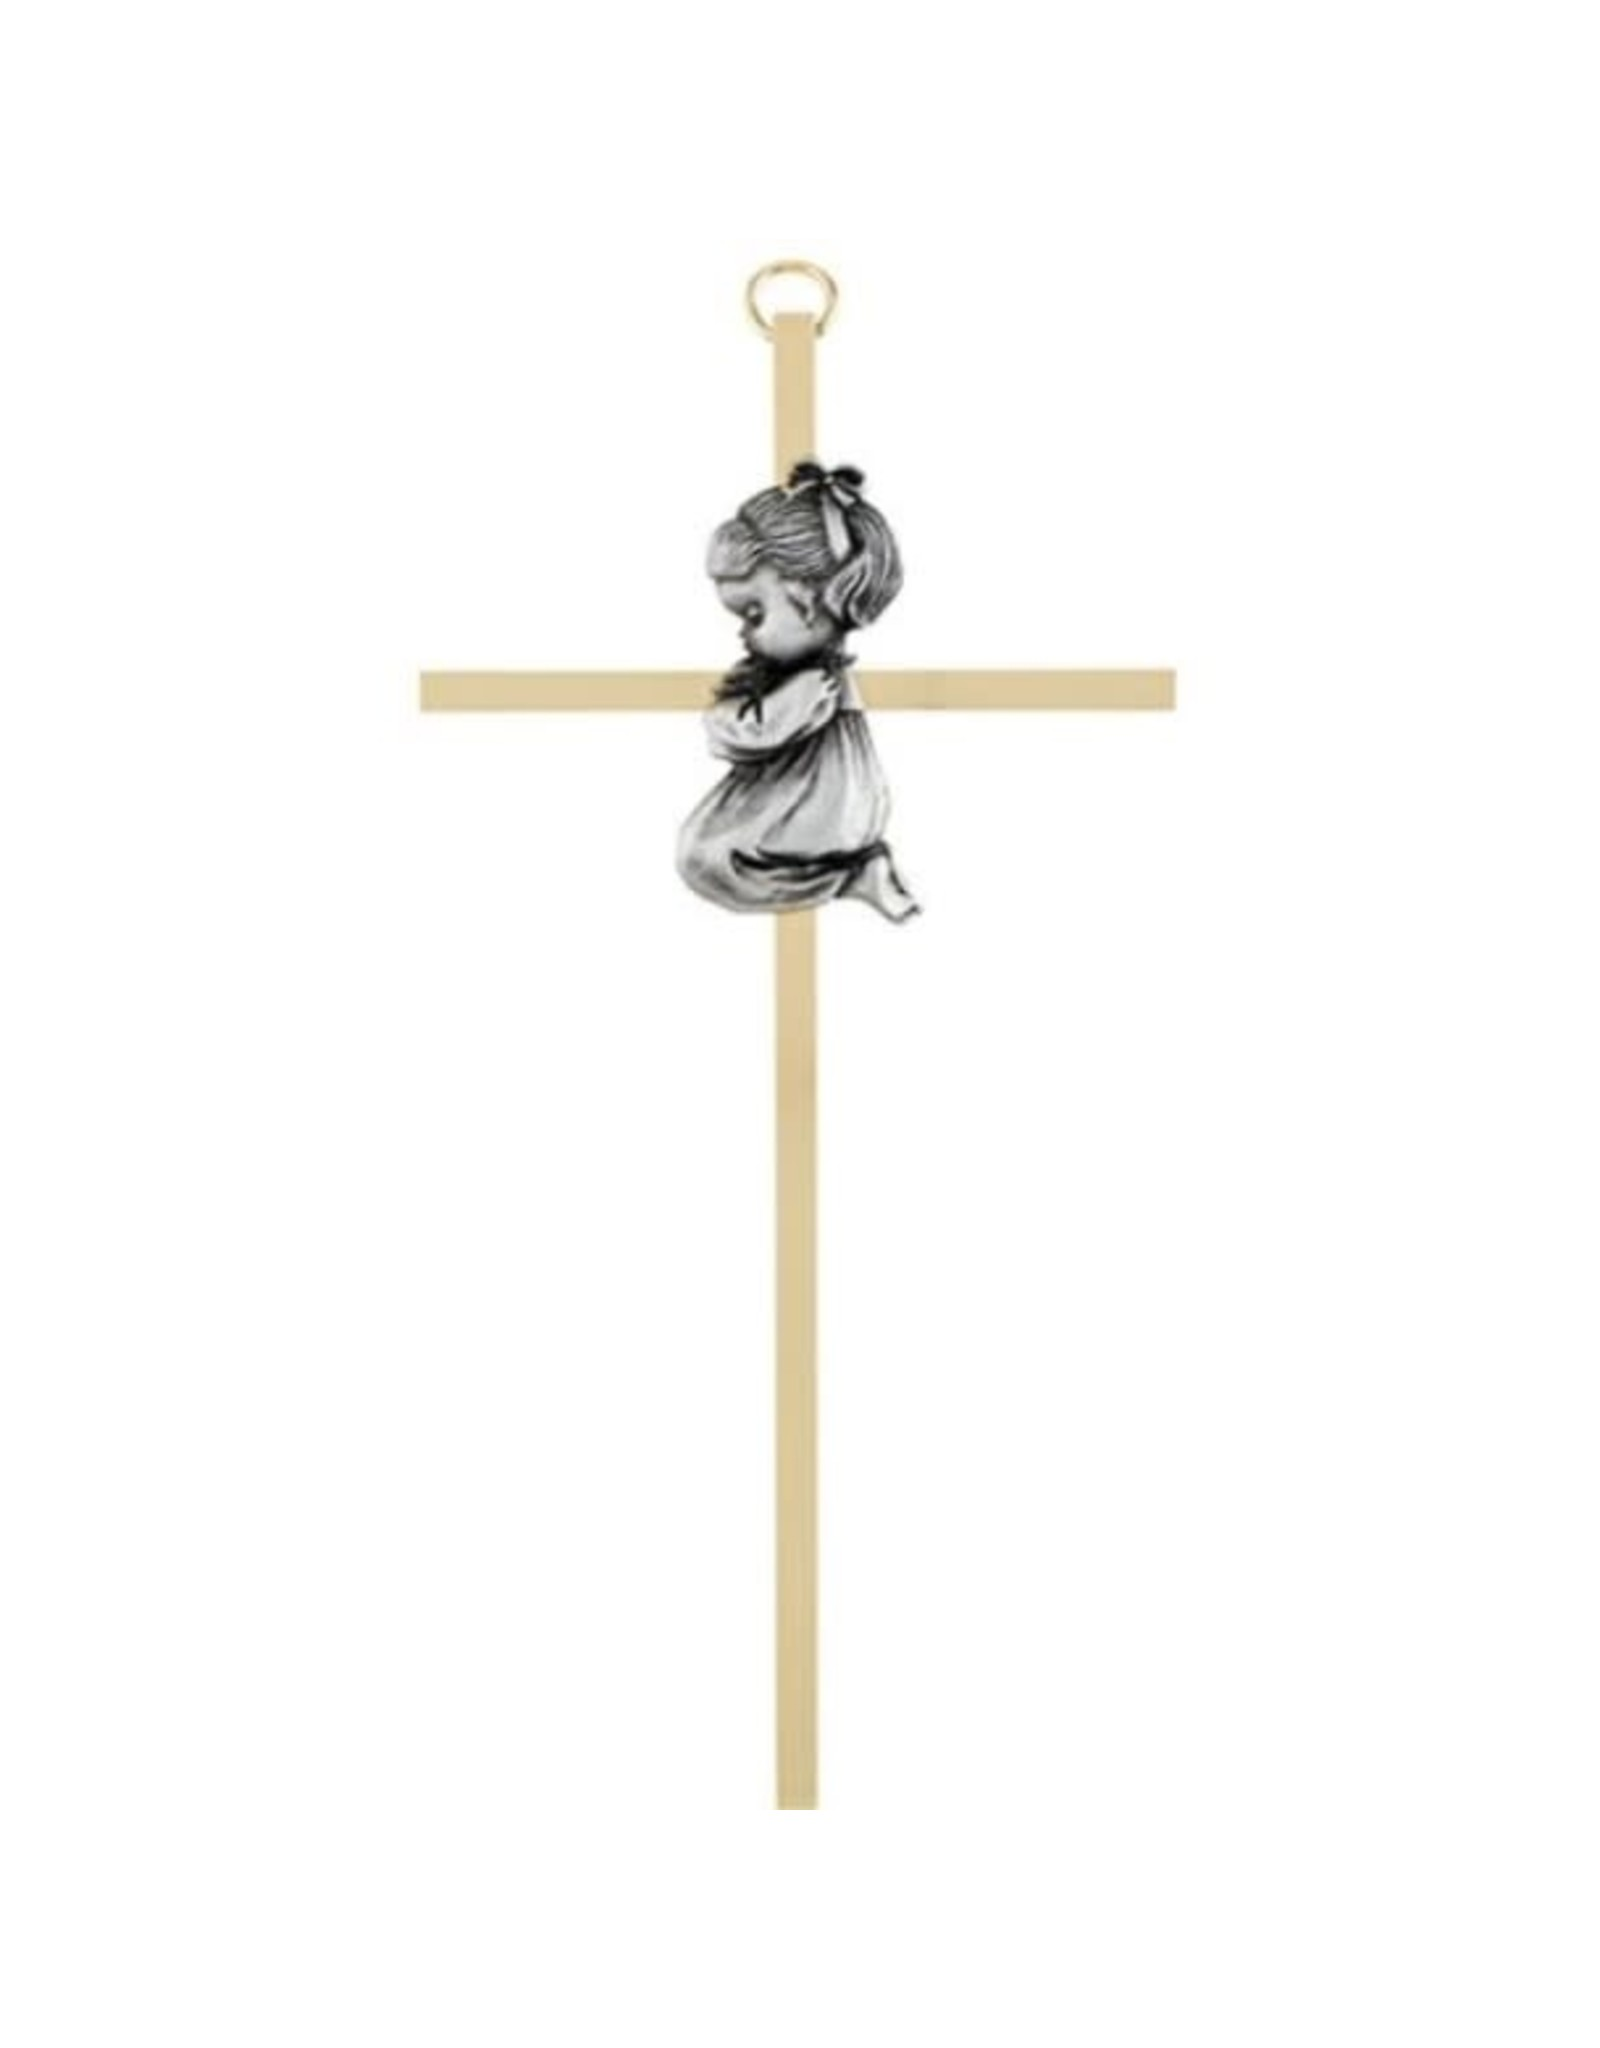 Christian Brands Brass Cross with Emblem - Baby Girl